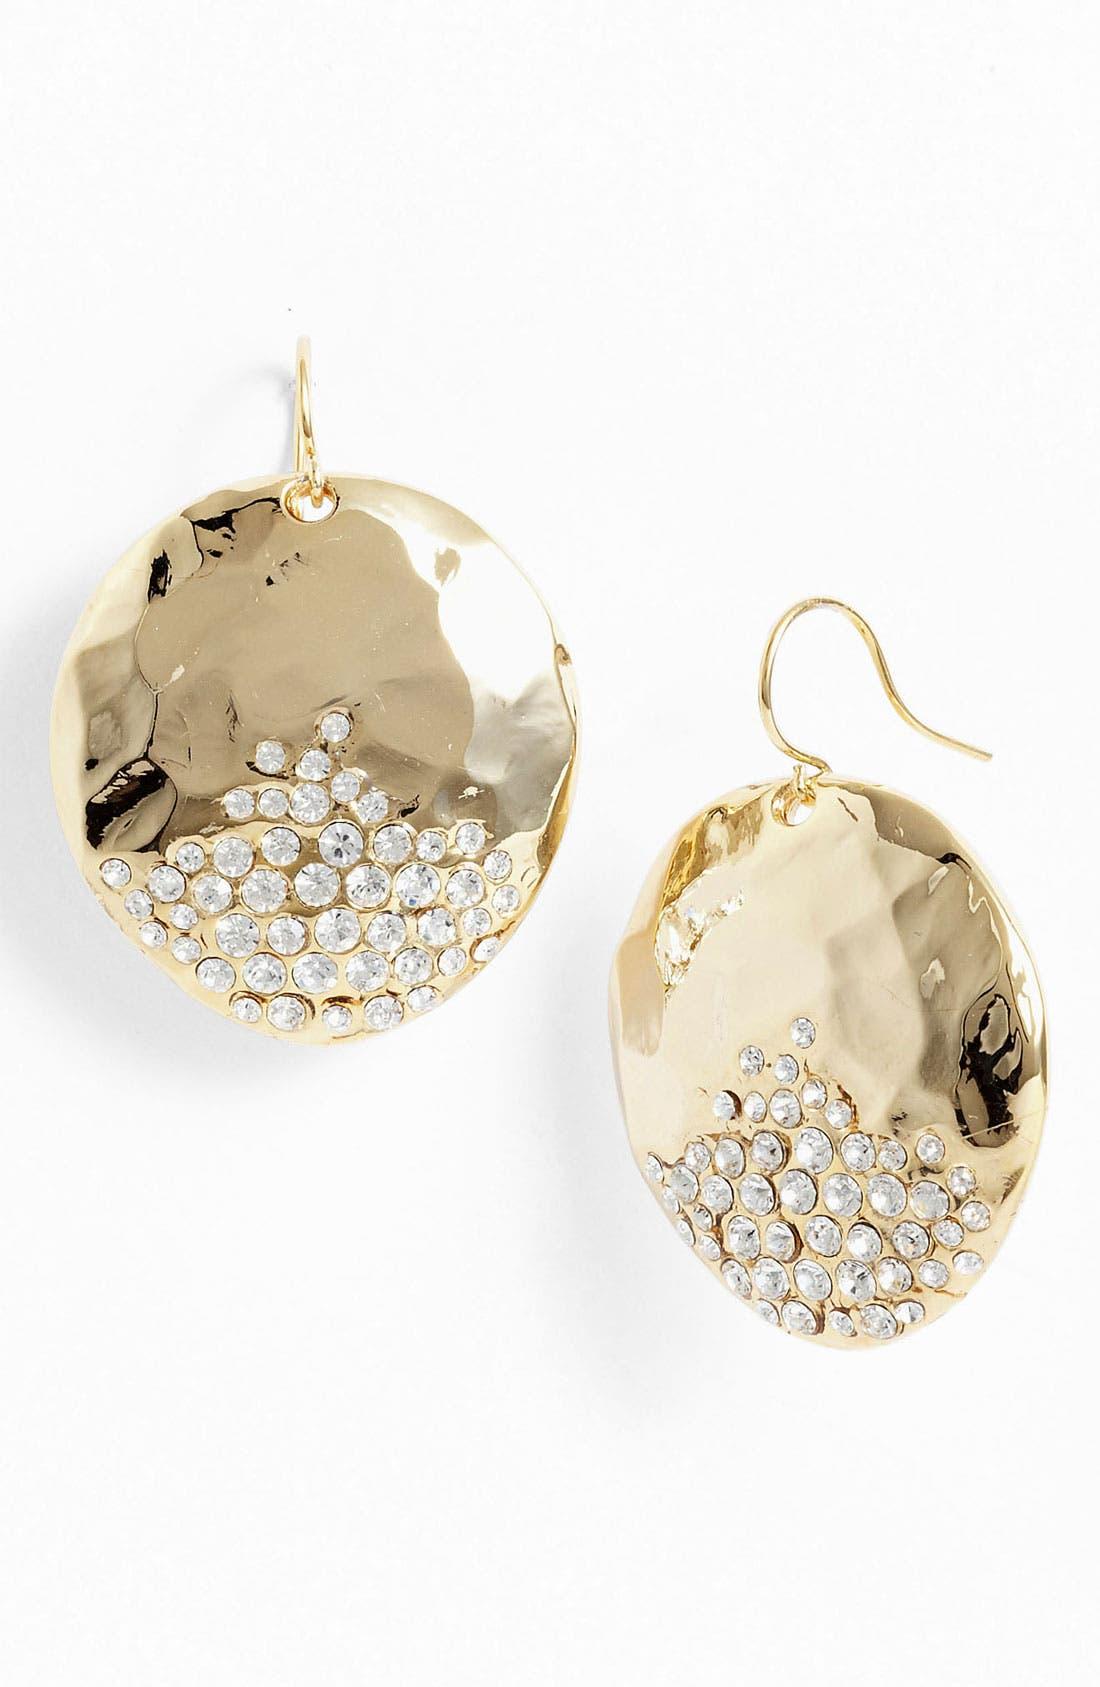 Main Image - Nordstrom 'Sand Dollar' Drop Earrings